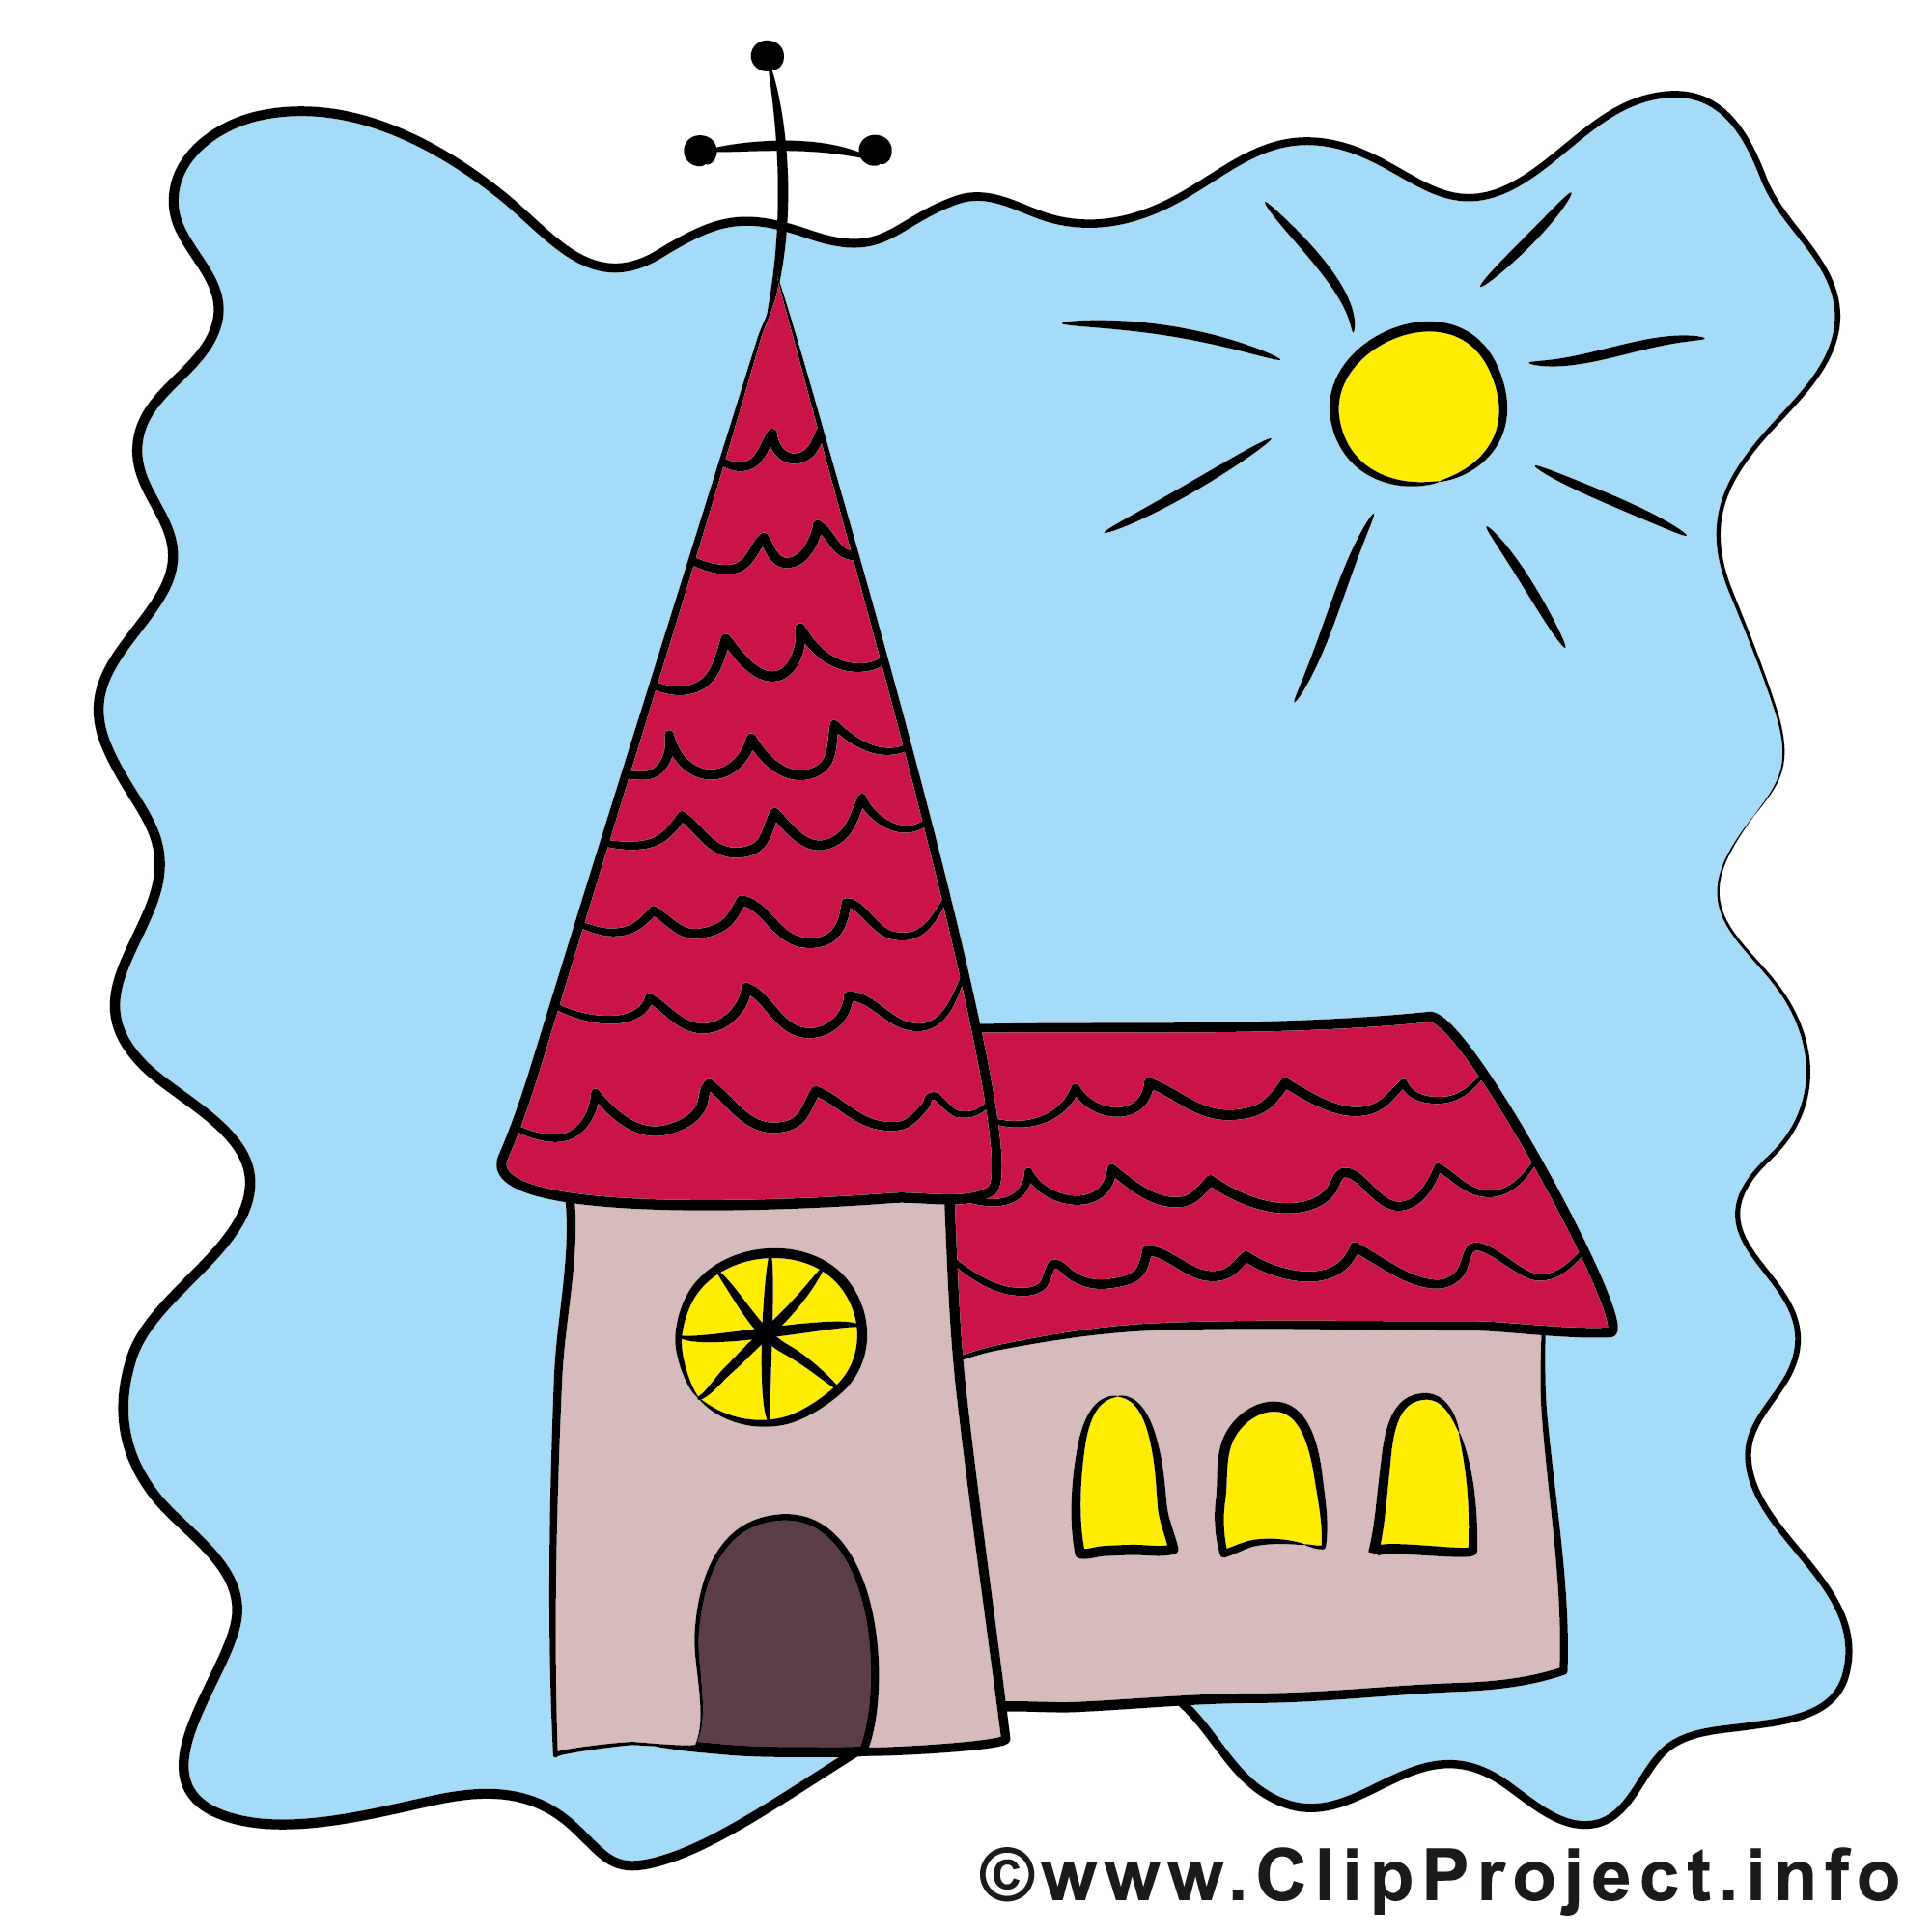 Einladung clipart schwarz wei png transparent stock Kirche clipart schwarz weiß - ClipartFest png transparent stock